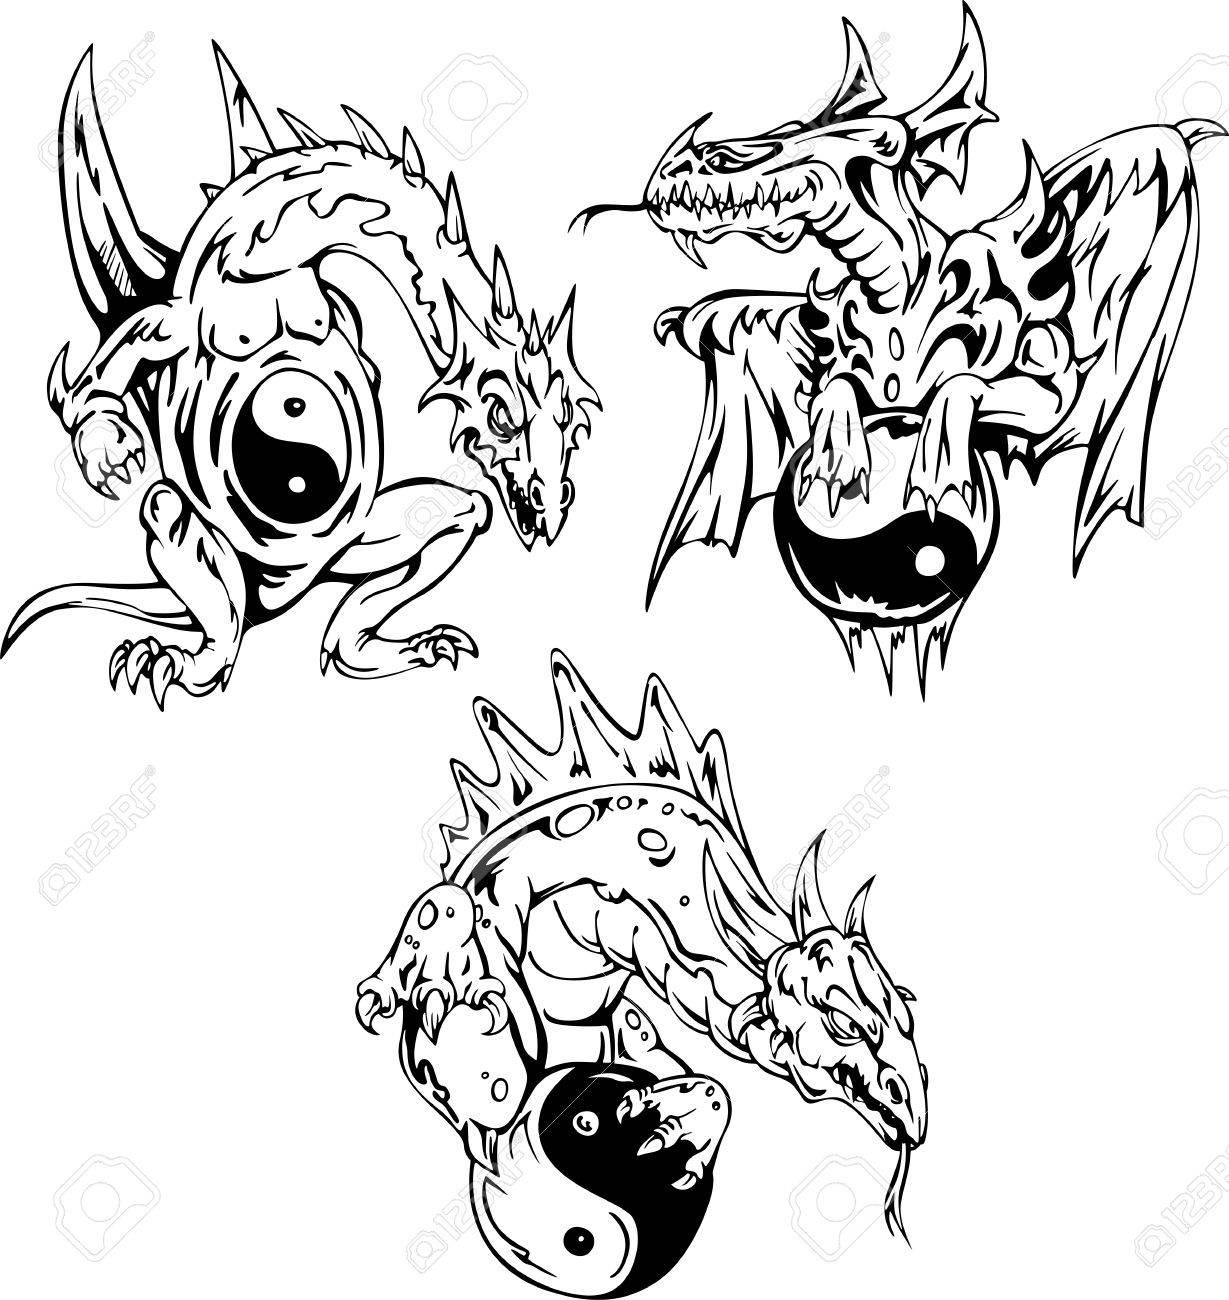 Dragon tattoos with yin-yang signs. Set of vector illustrations. Stock Vector - 15783283